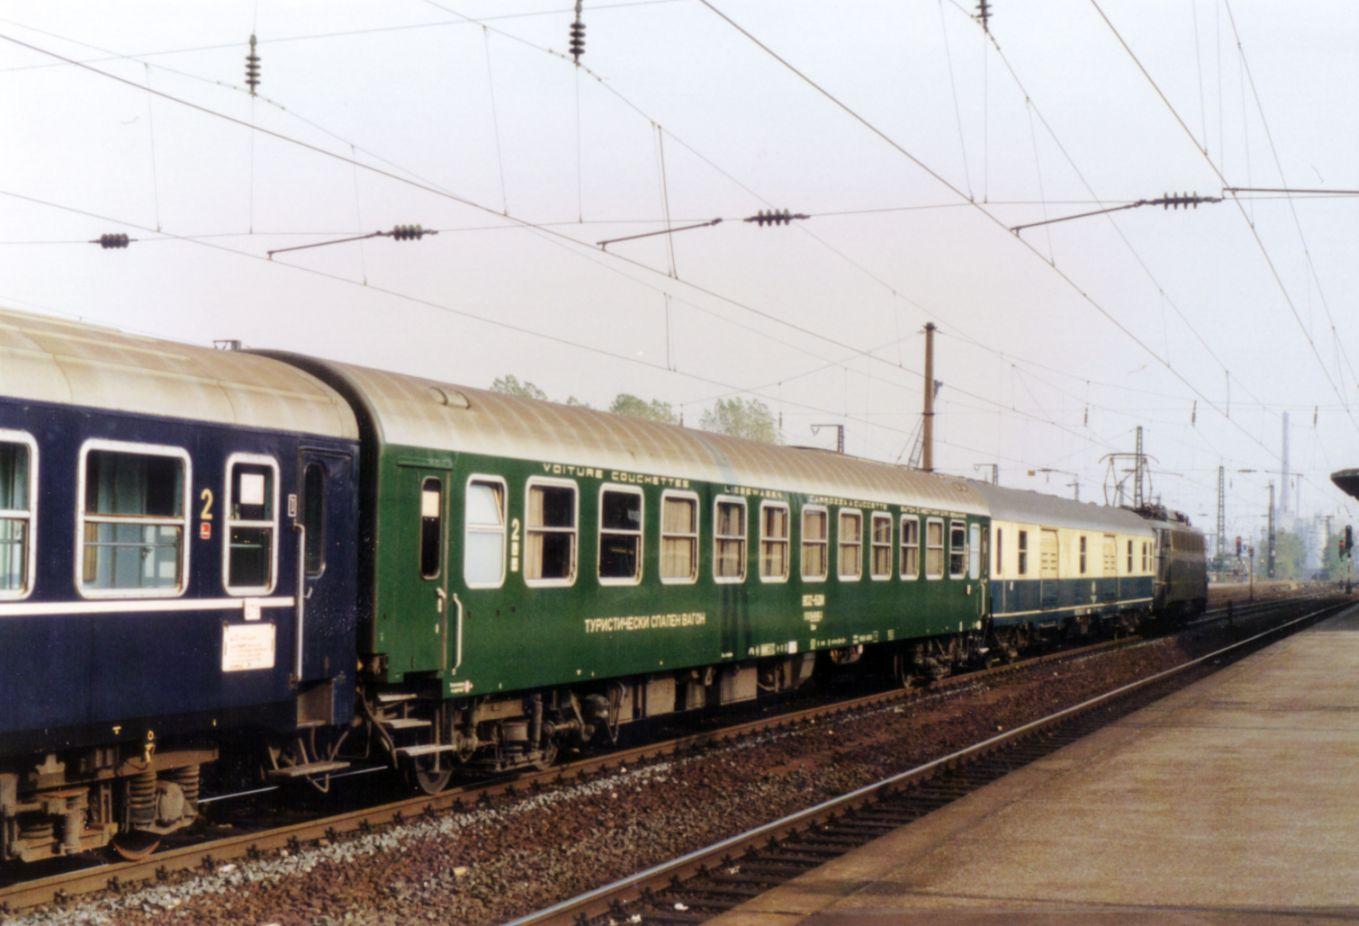 http://railfaneurope.net/pix/bg/car/night/Bcme/BDZ_Bc_1.jpg